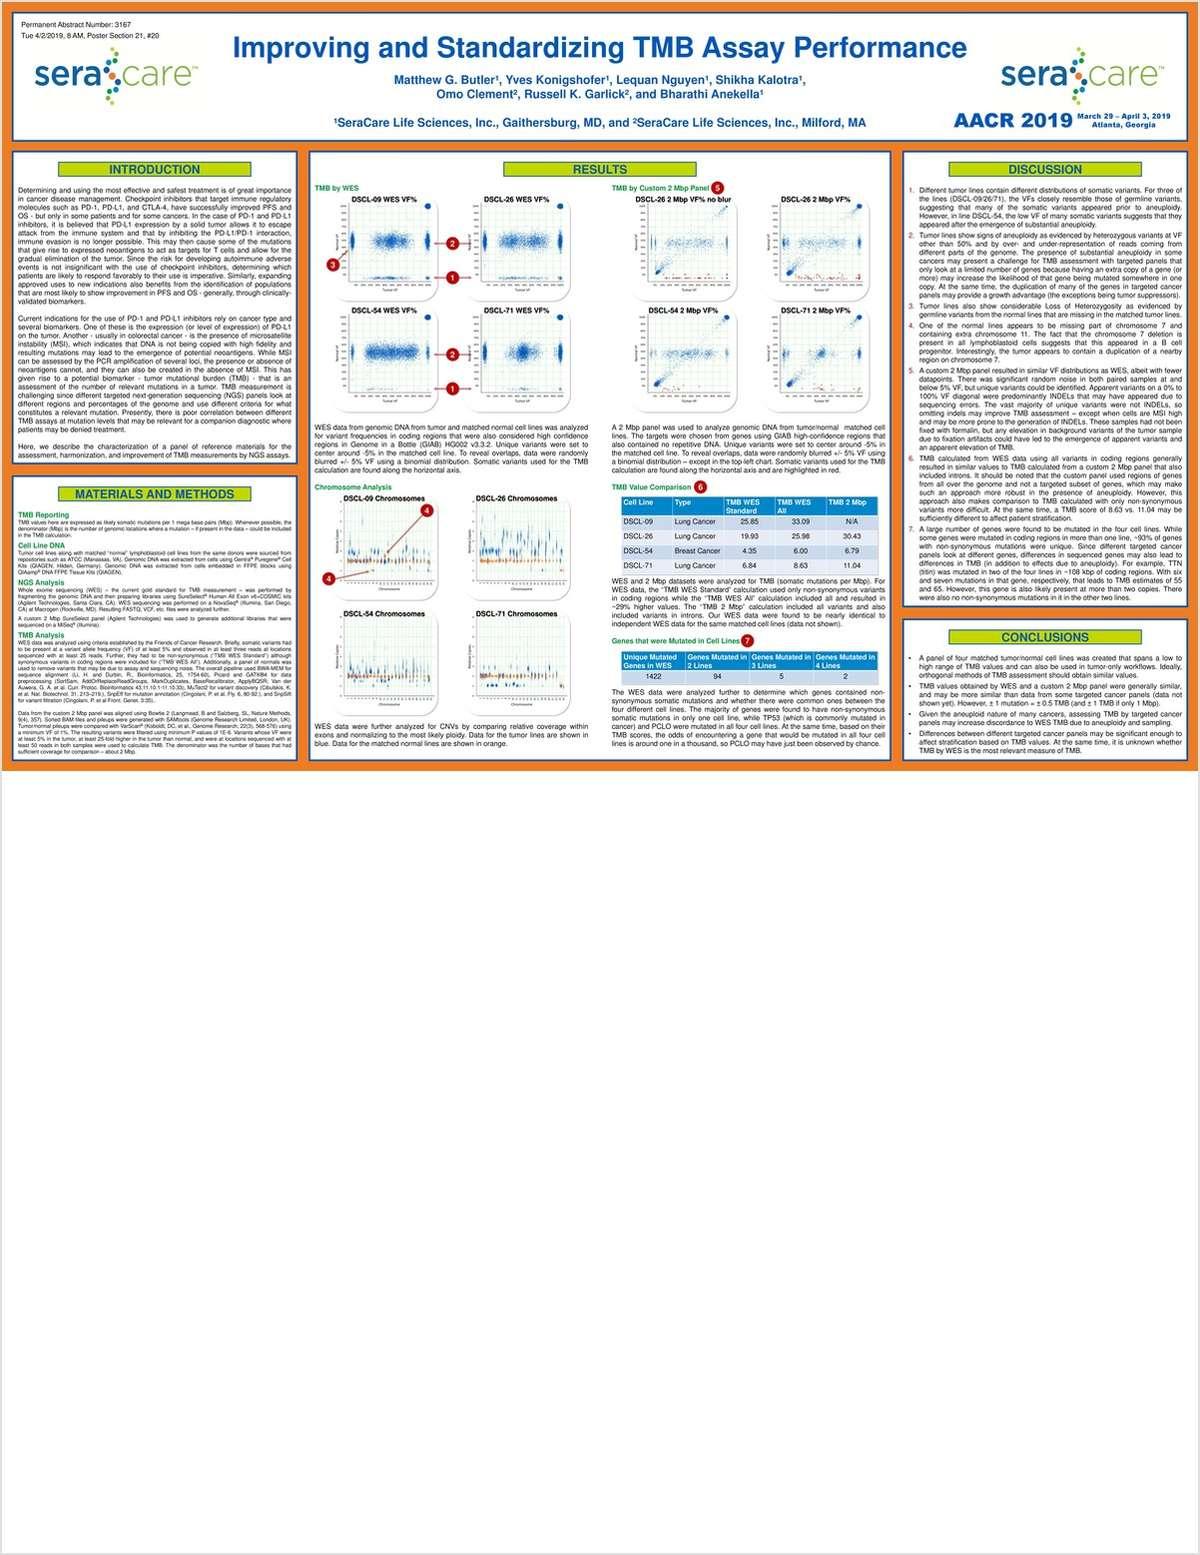 Improving and Standardizing TMB Assay Performance